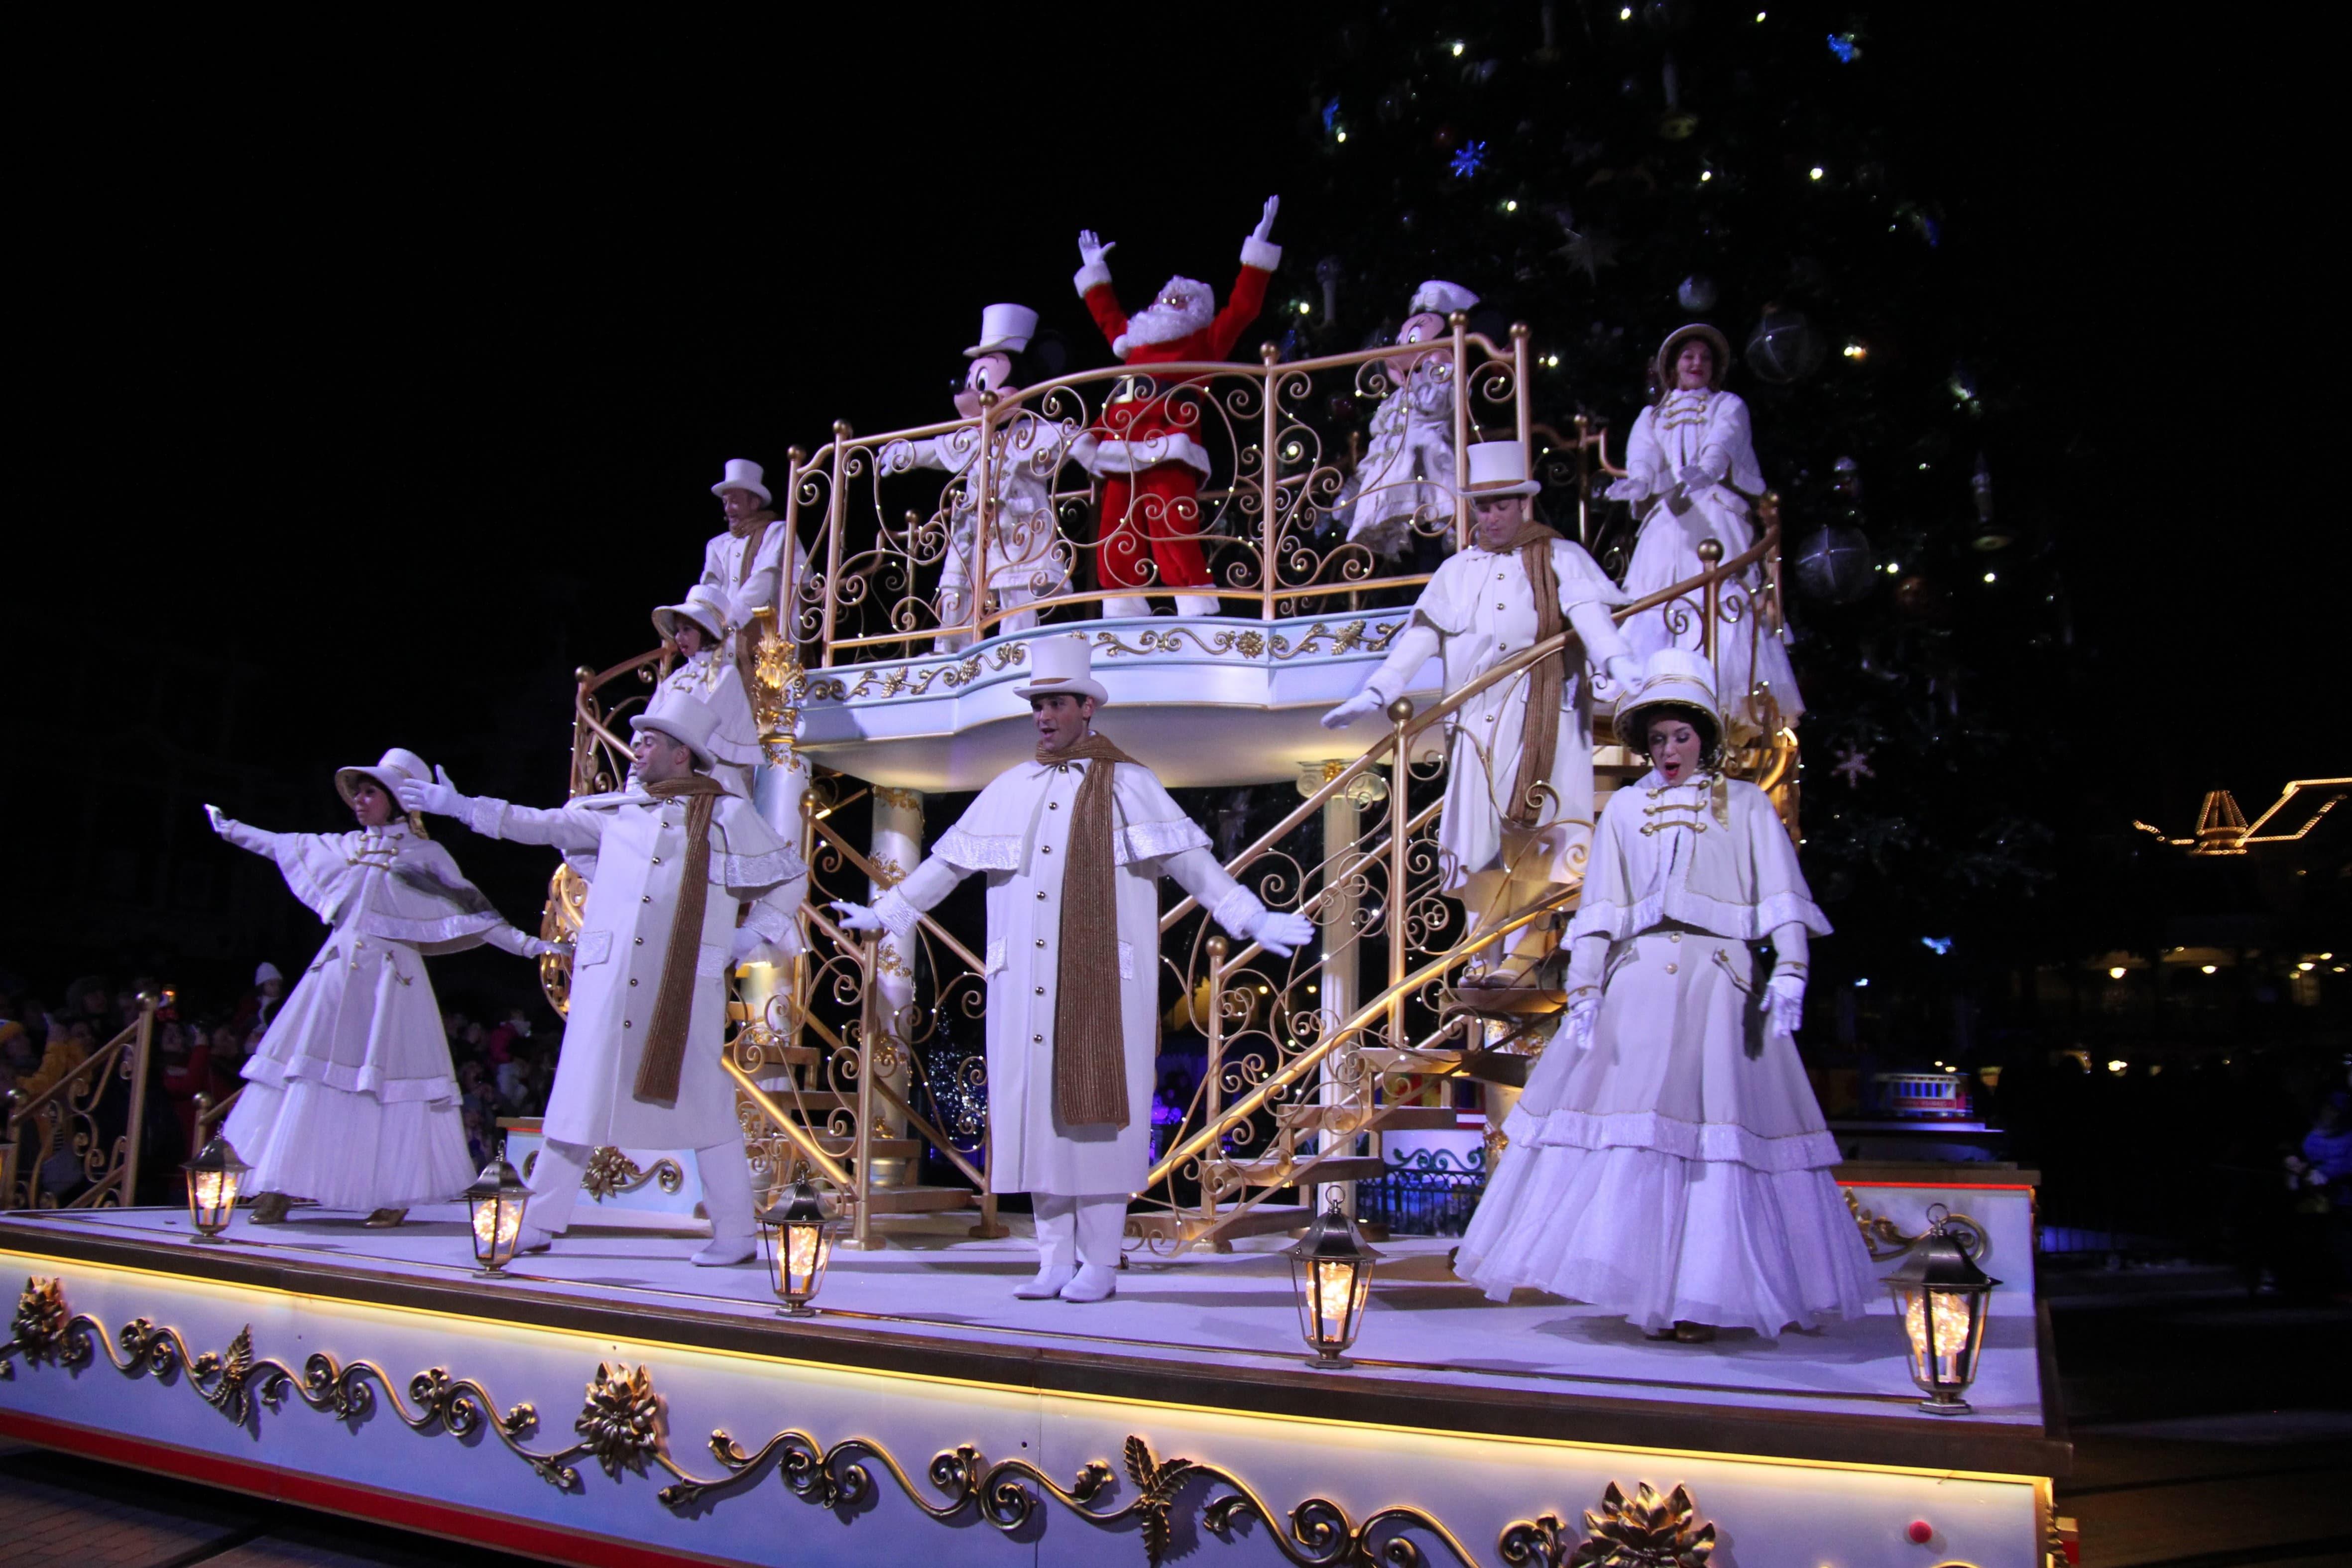 Disneyland Paris - Christmas 2017 - Mickey's Christmas Lights